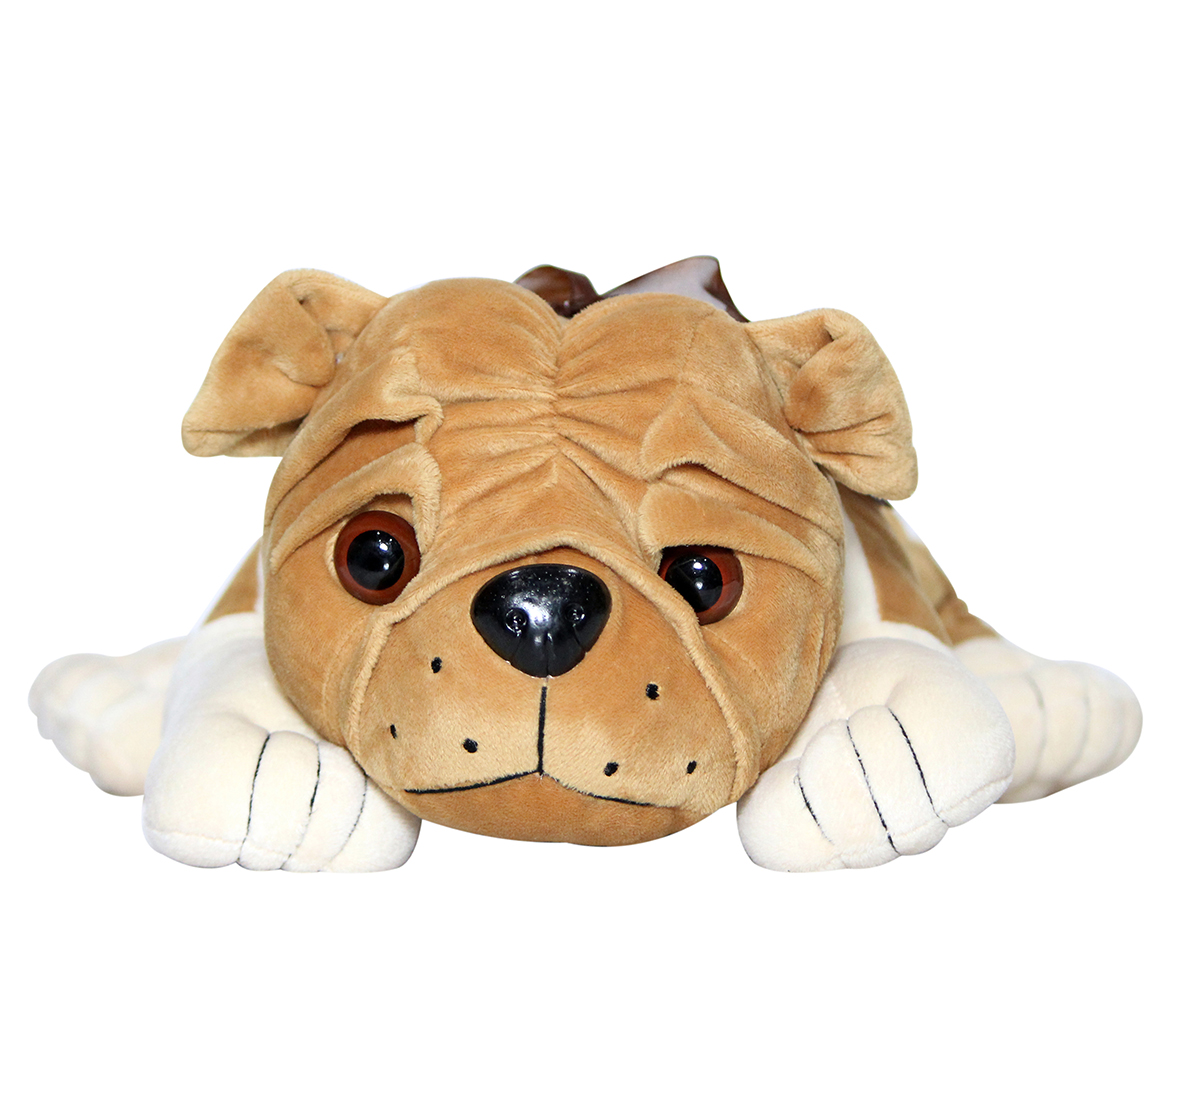 Soft Buddies | Soft Buddies Lying Bull Dog Large, Unisex, 9M+ (Light Brown)